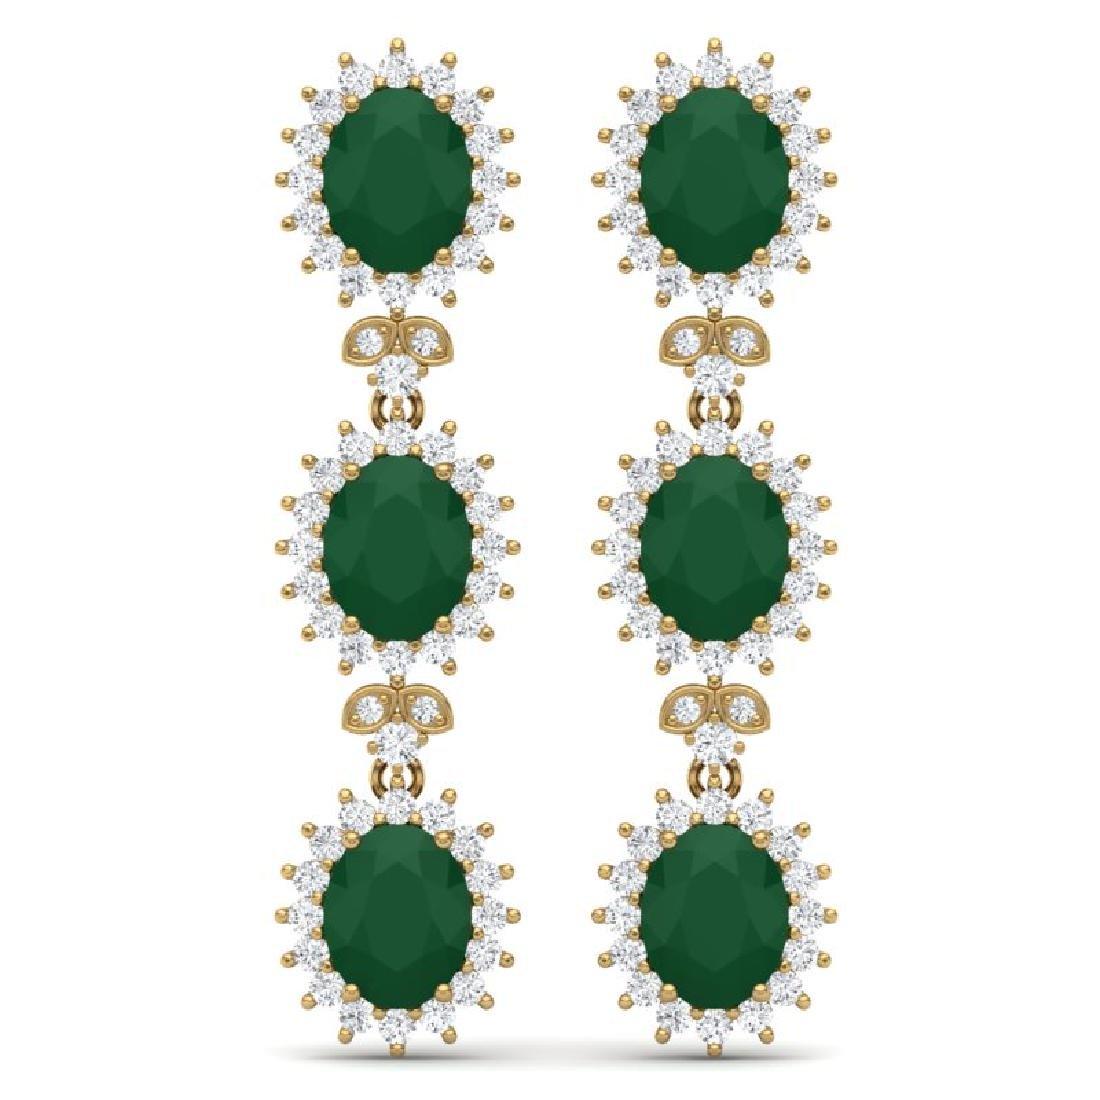 24.52 CTW Royalty Emerald & VS Diamond Earrings 18K